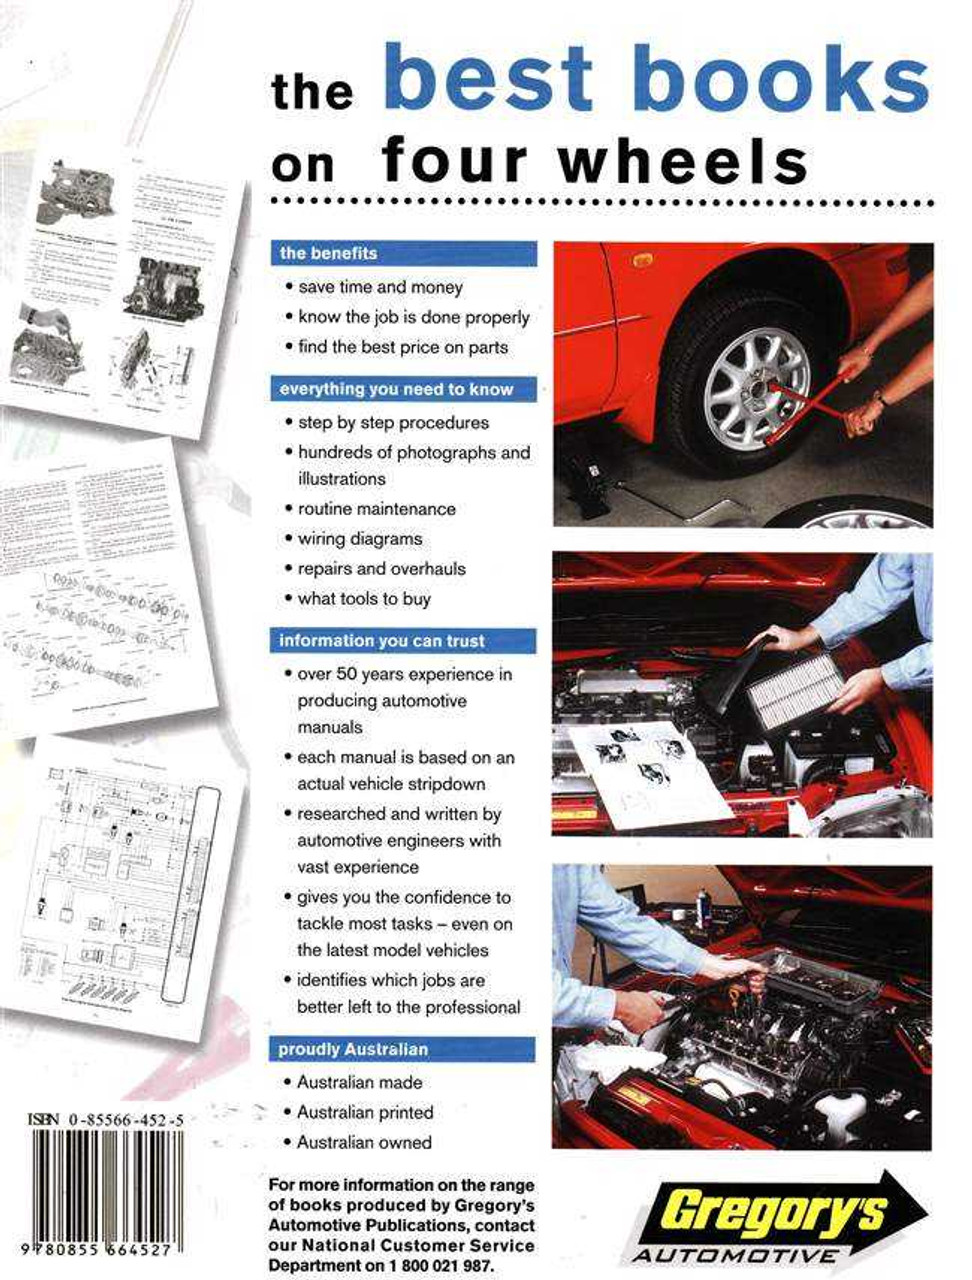 Toyota Corona 2000 1976 - 1979 Workshop Manual on